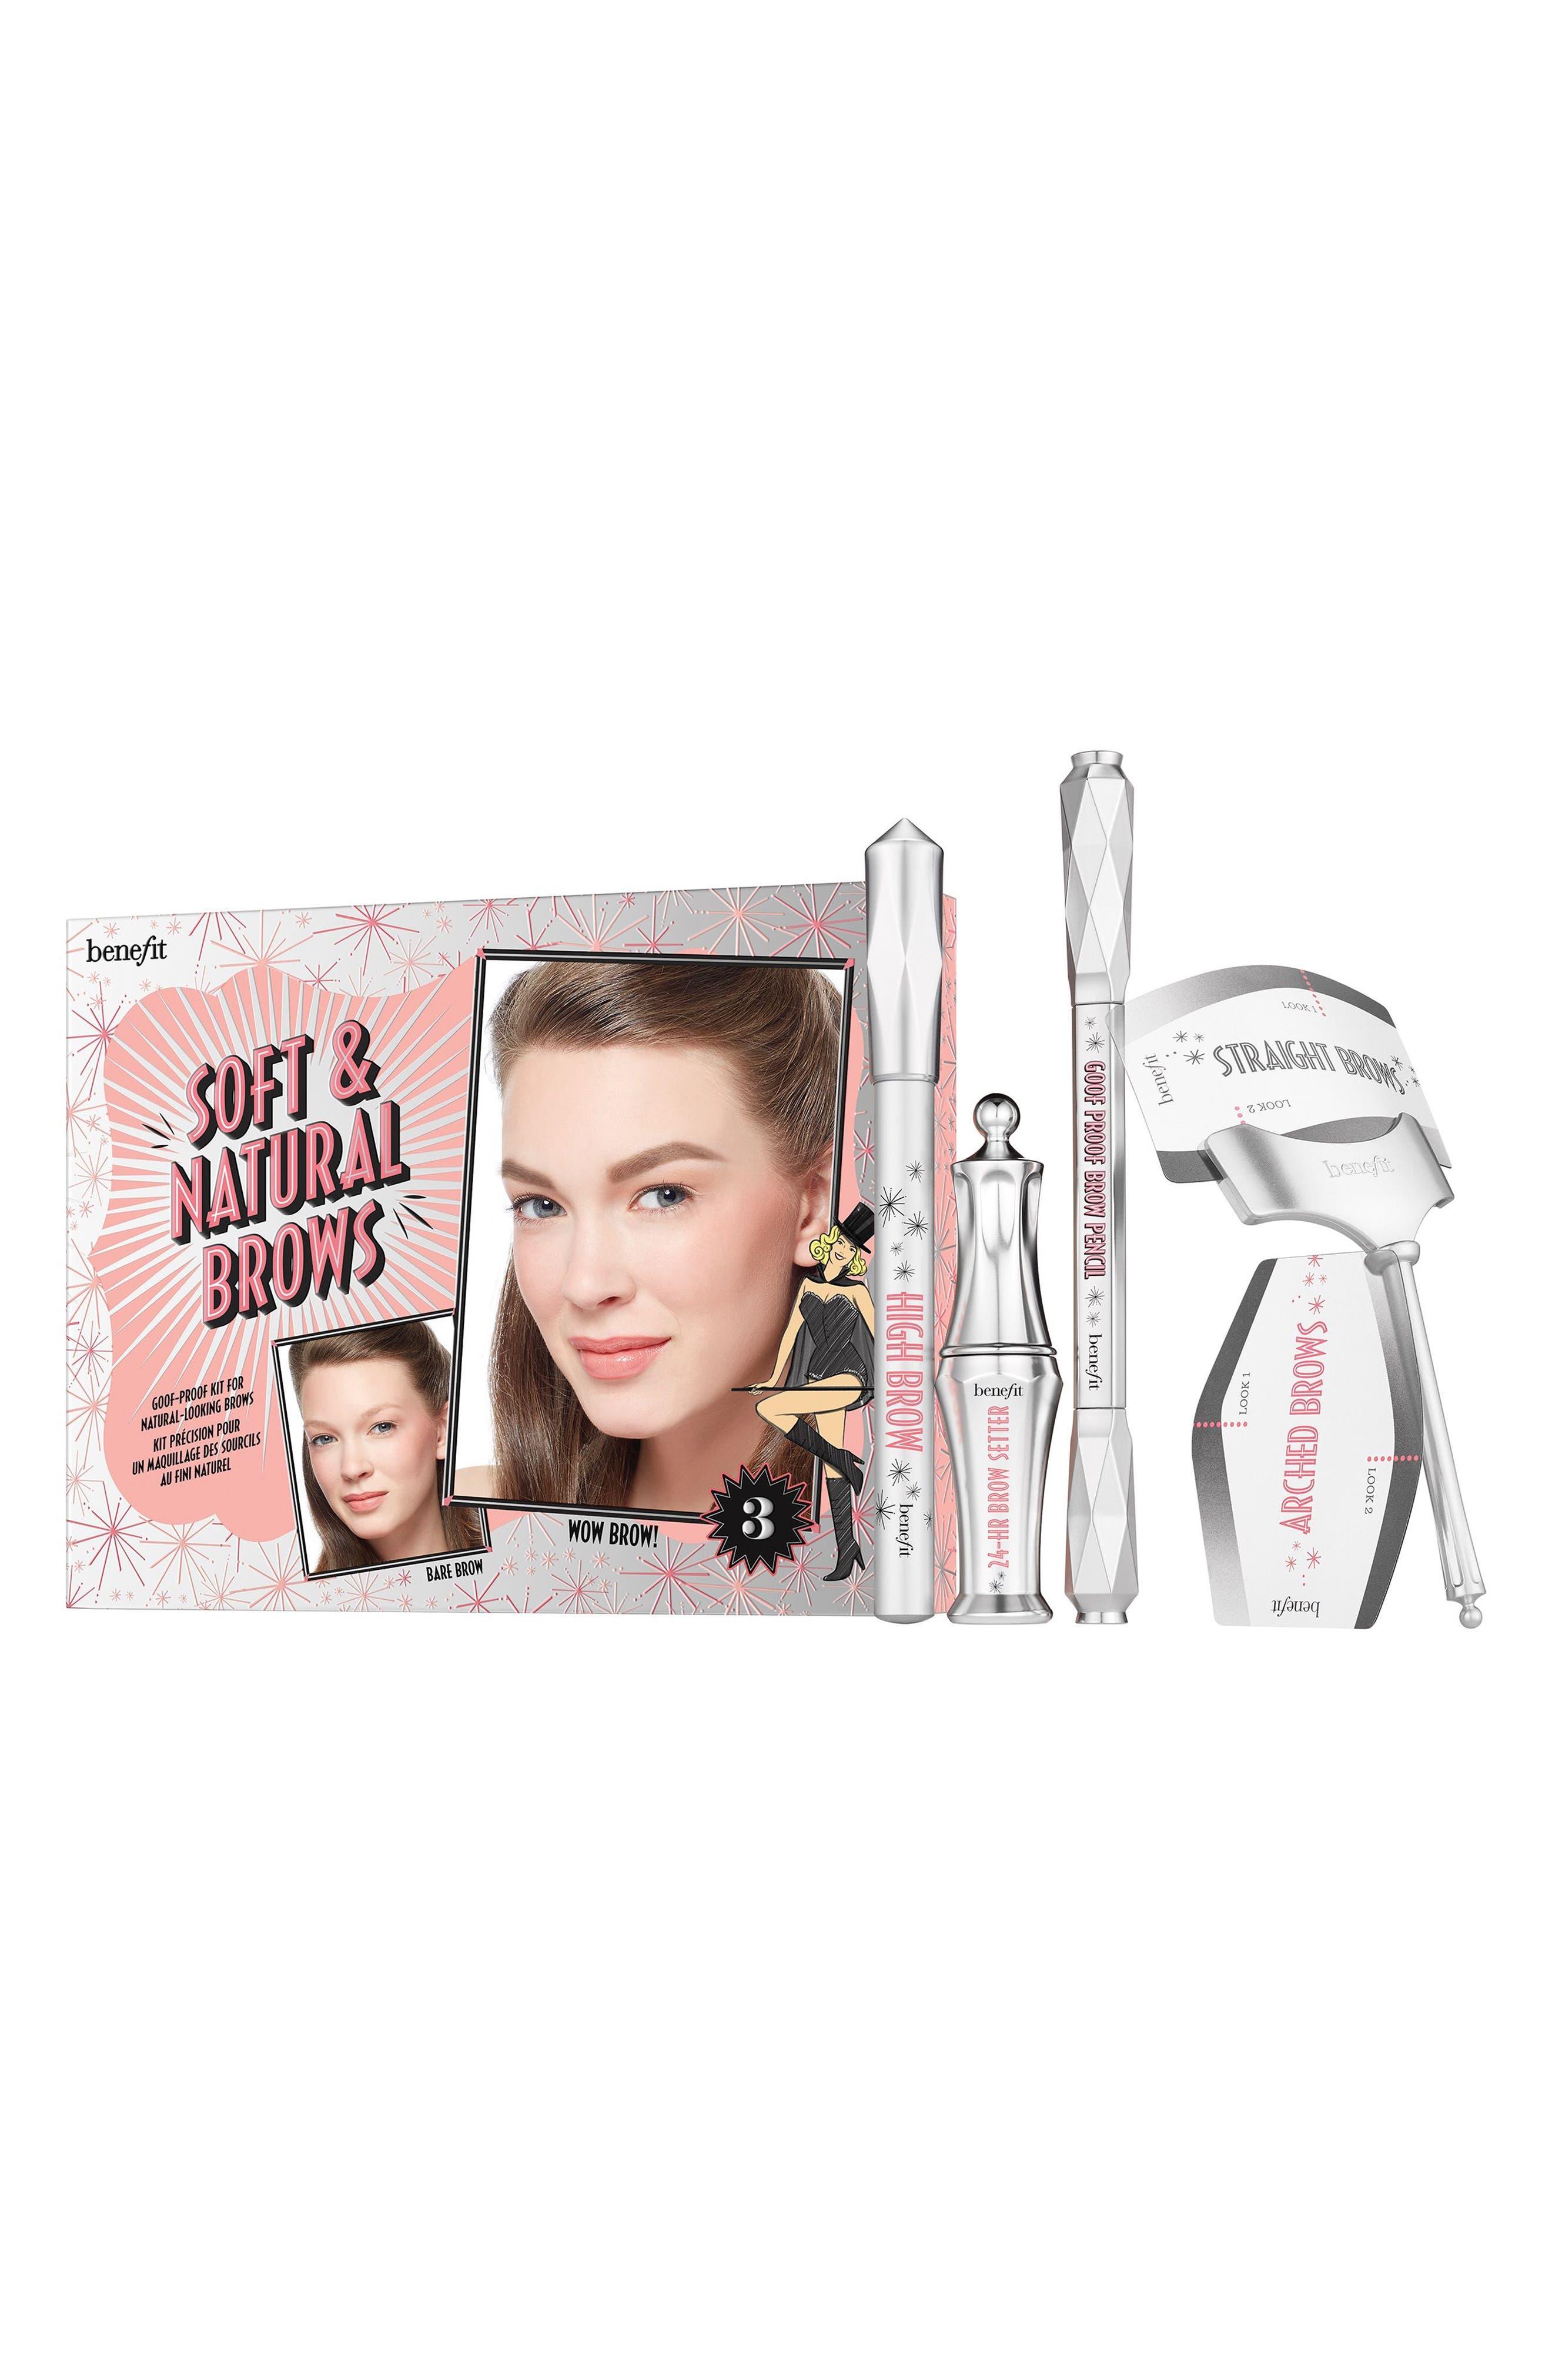 Benefit Soft & Natural Brows Kit,                         Main,                         color, 03 Medium